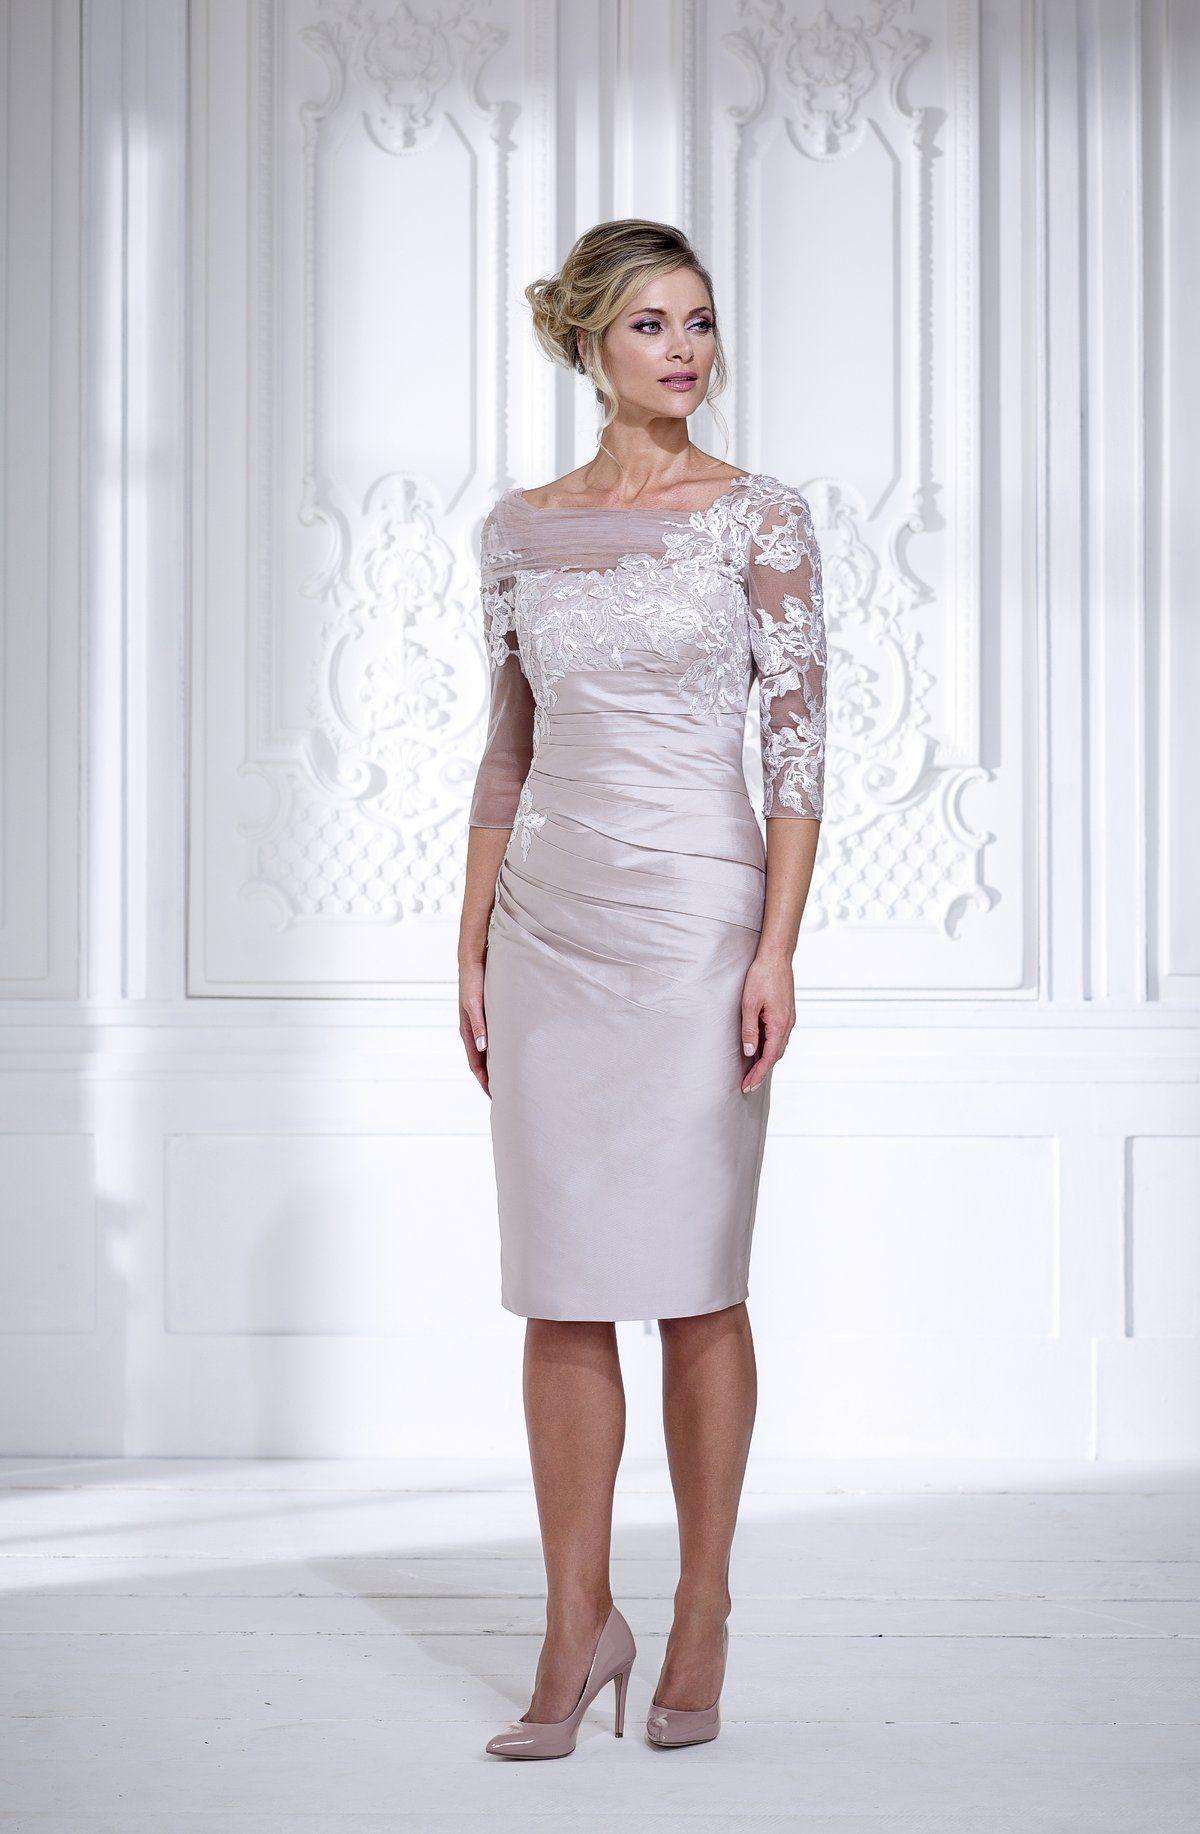 Occasion Wear By Irresistible - Dressini in 12  Hochzeitsfeier